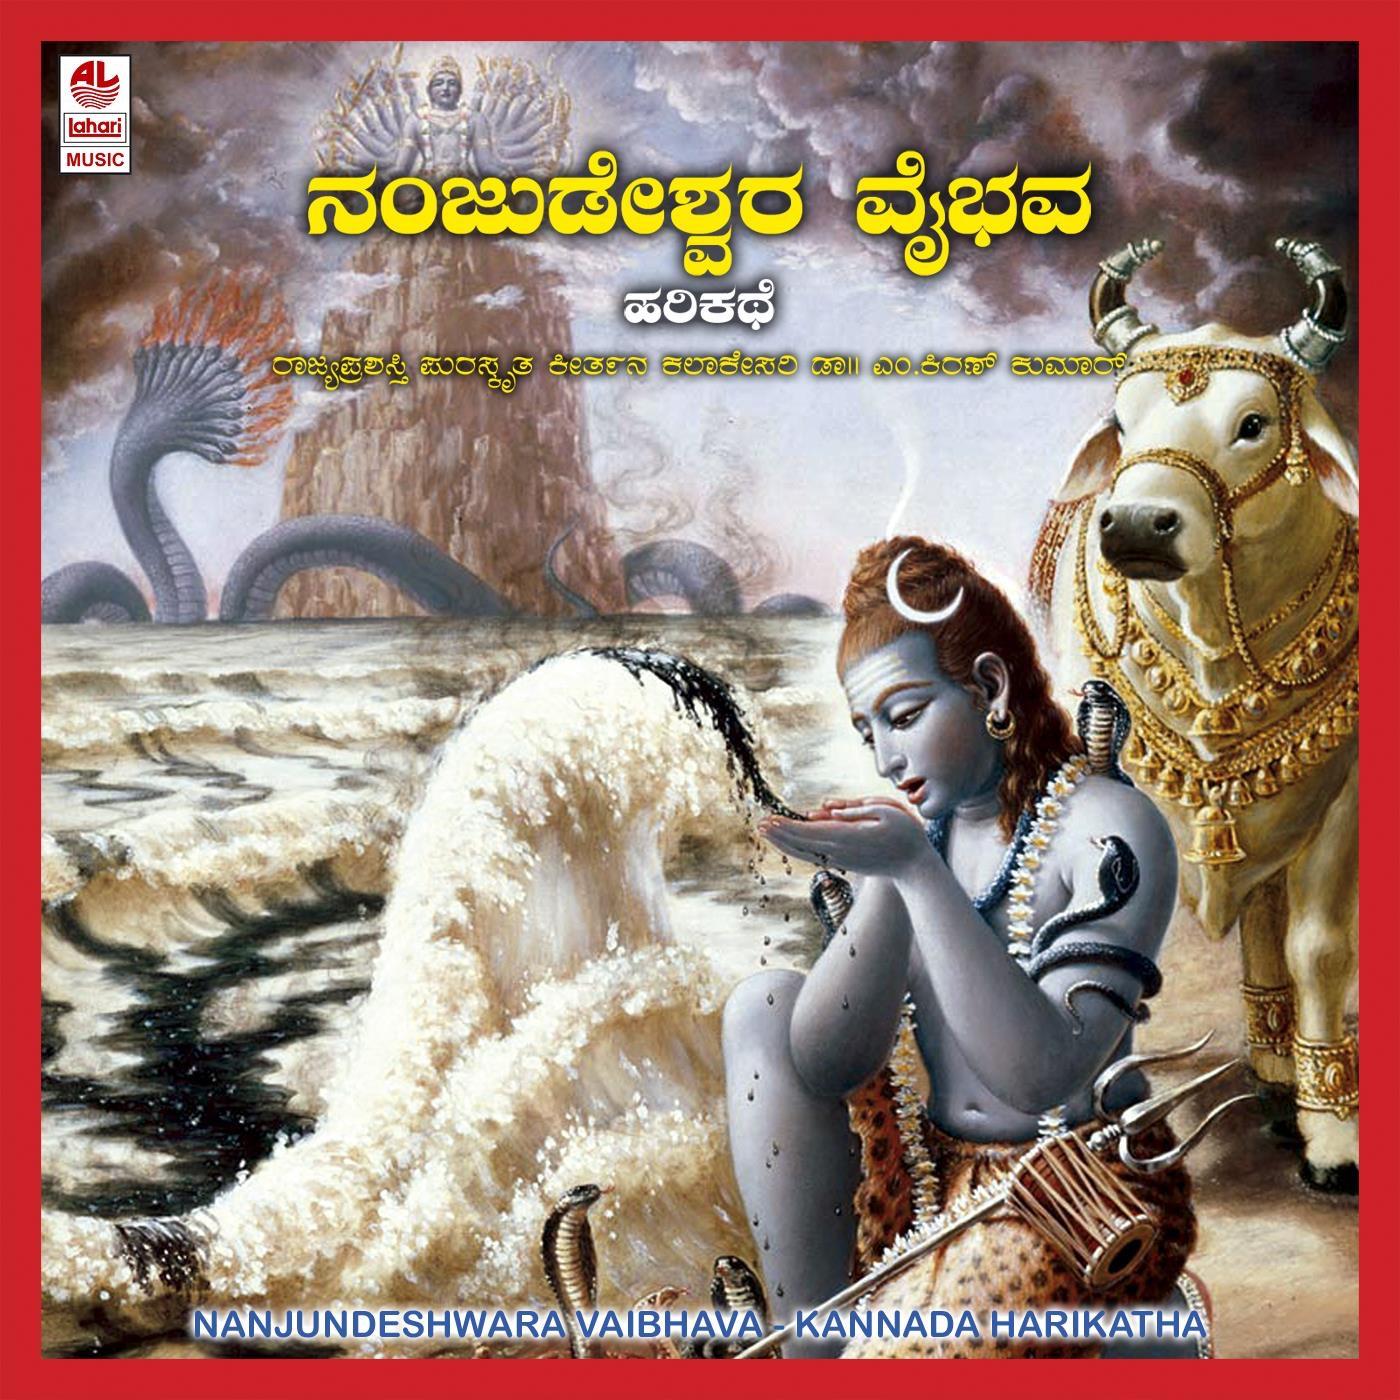 Nanjundeshwara Vaibhava